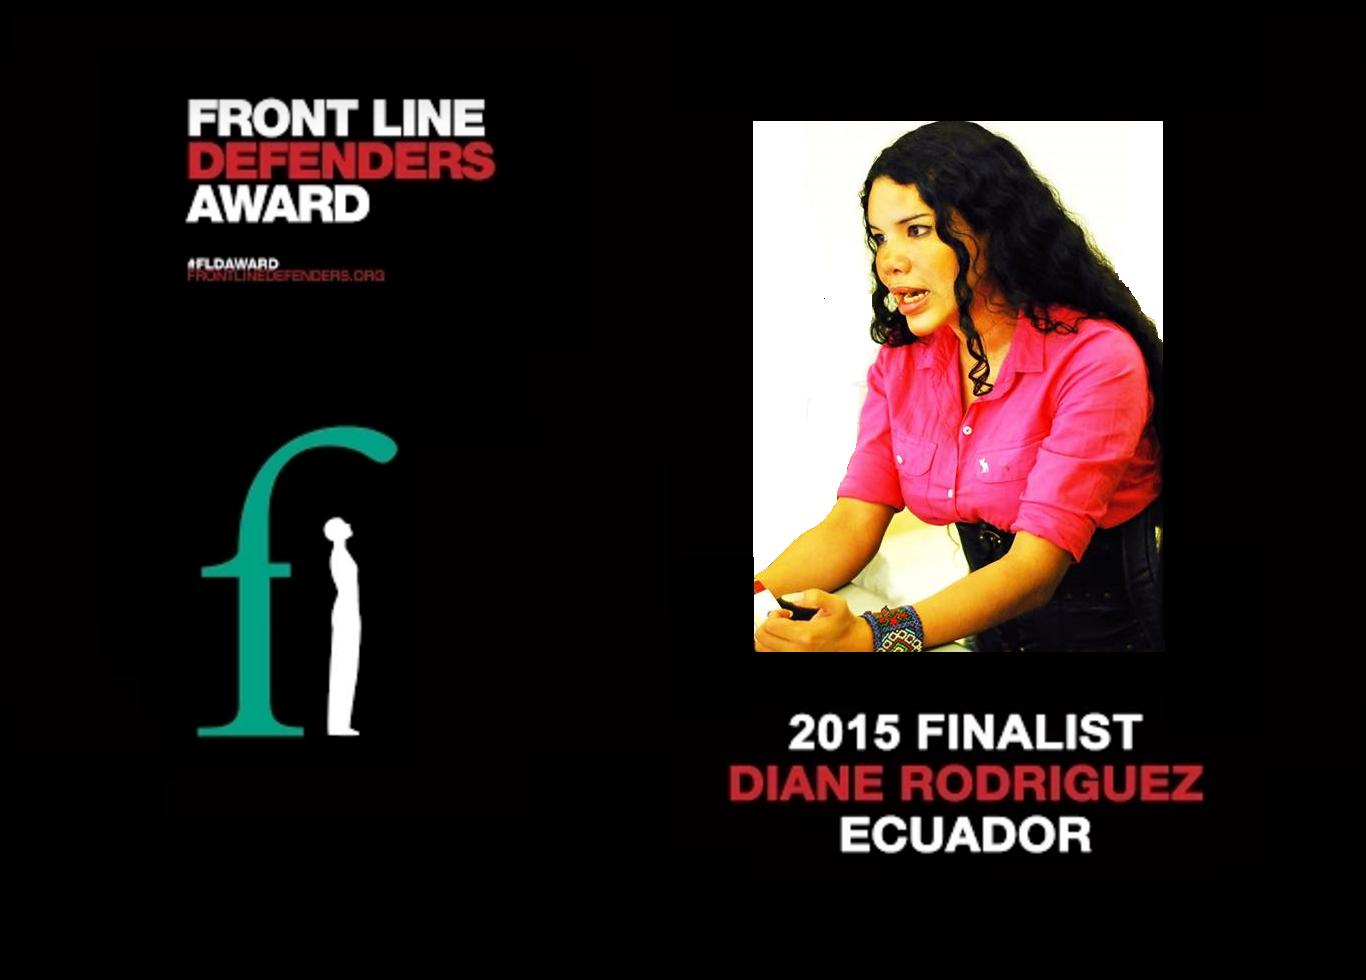 Diane Rodriguez - Front Line Defenders Award